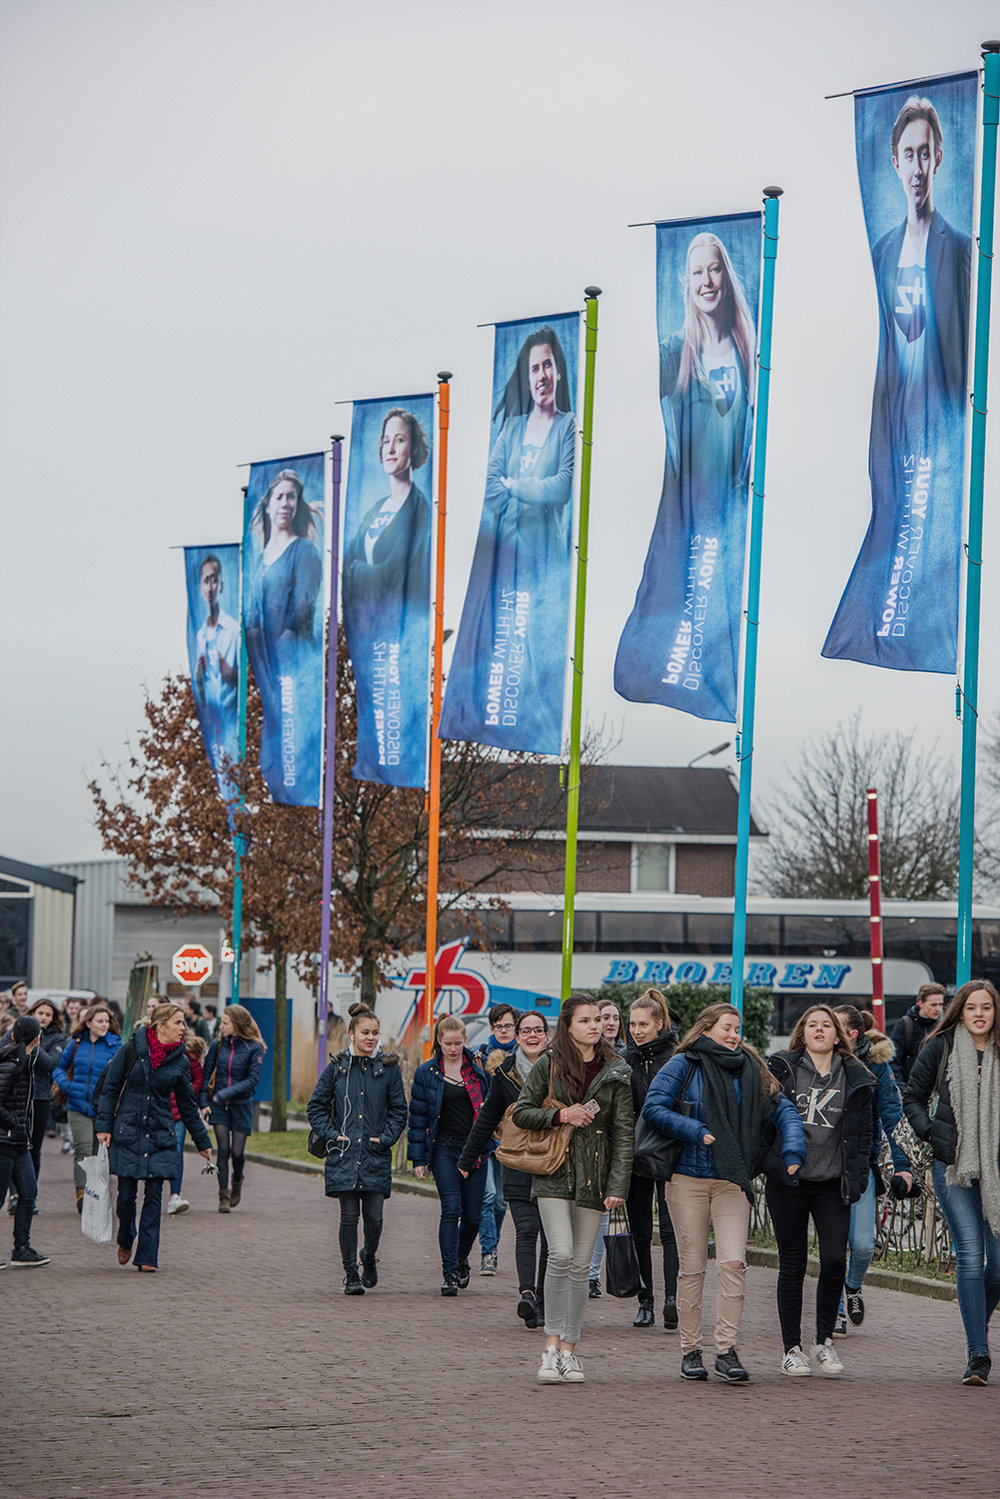 Copy of Uitingen van 'Discover your power with HZ' campagne